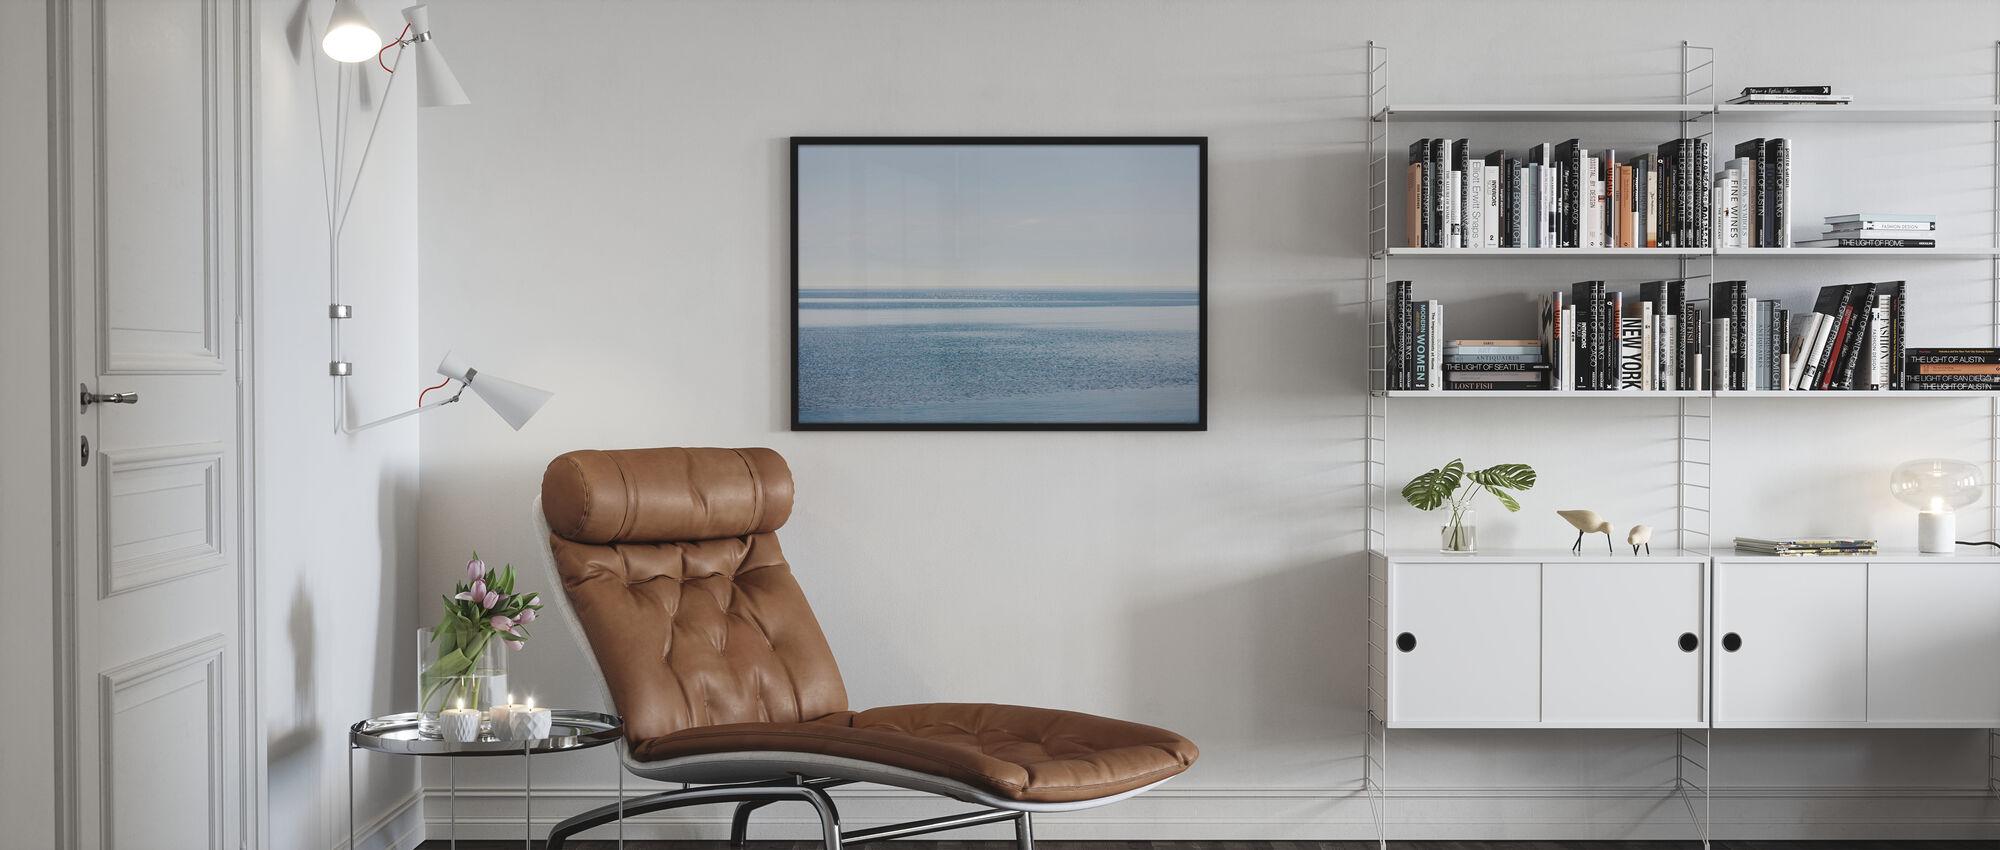 Sparkling Sea - Framed print - Living Room